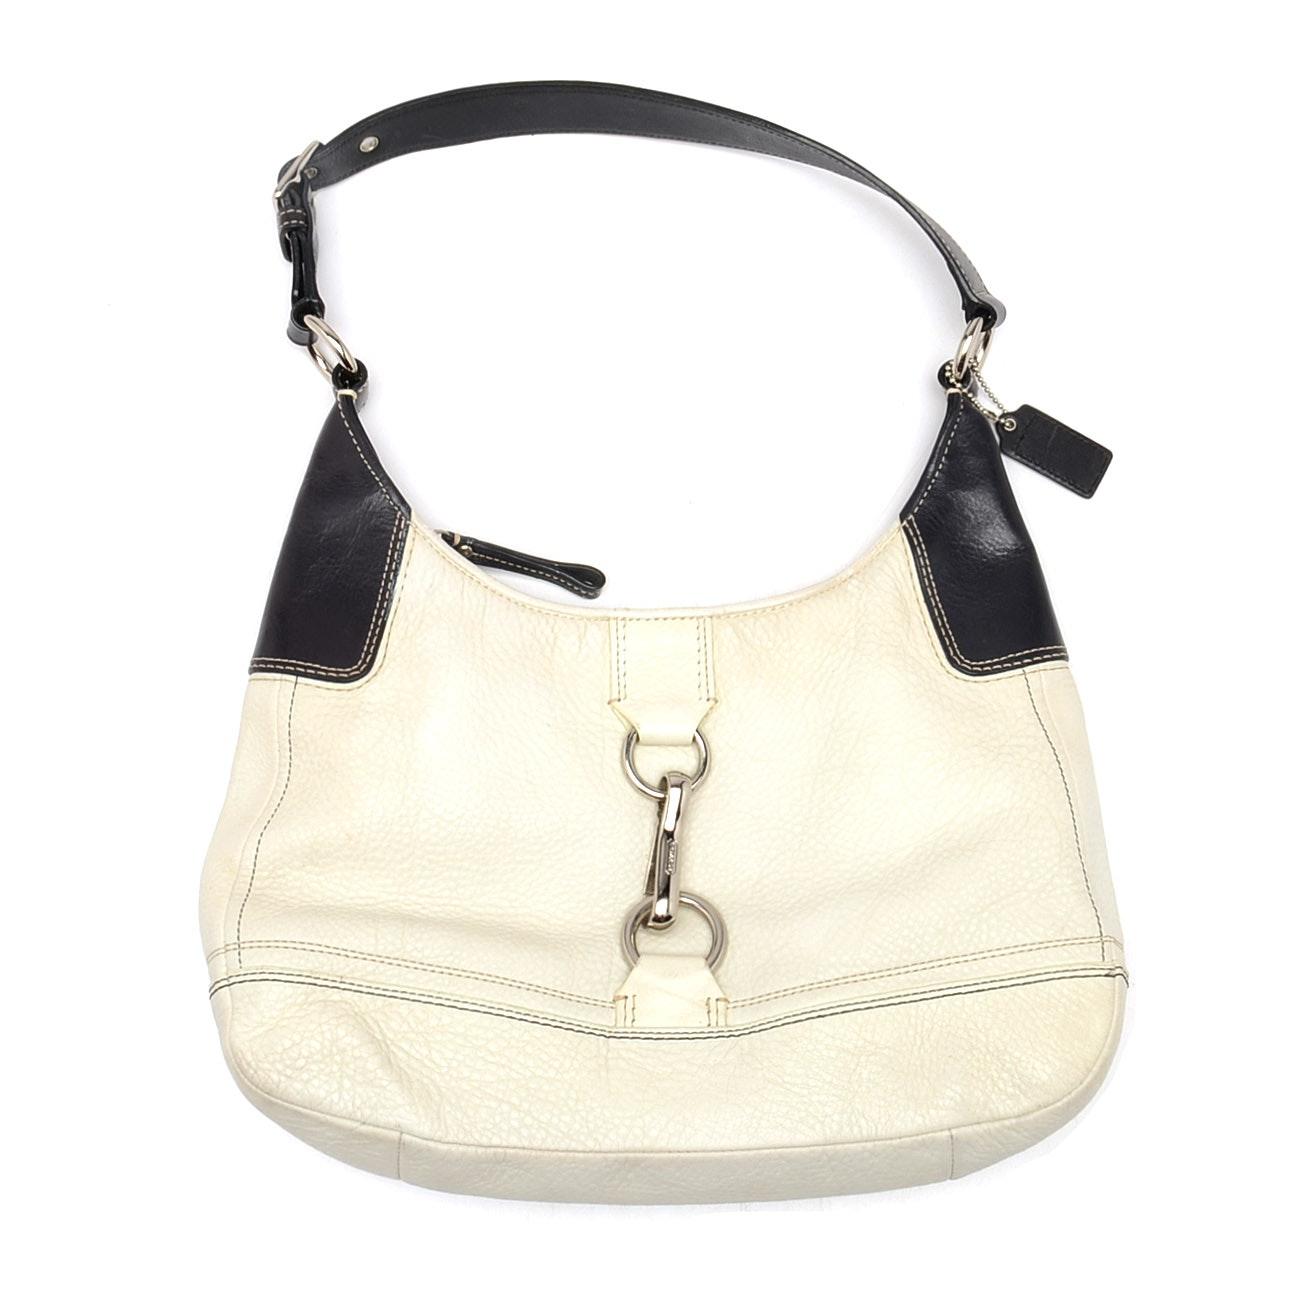 Coach Hamilton Leather Hobo Handbag